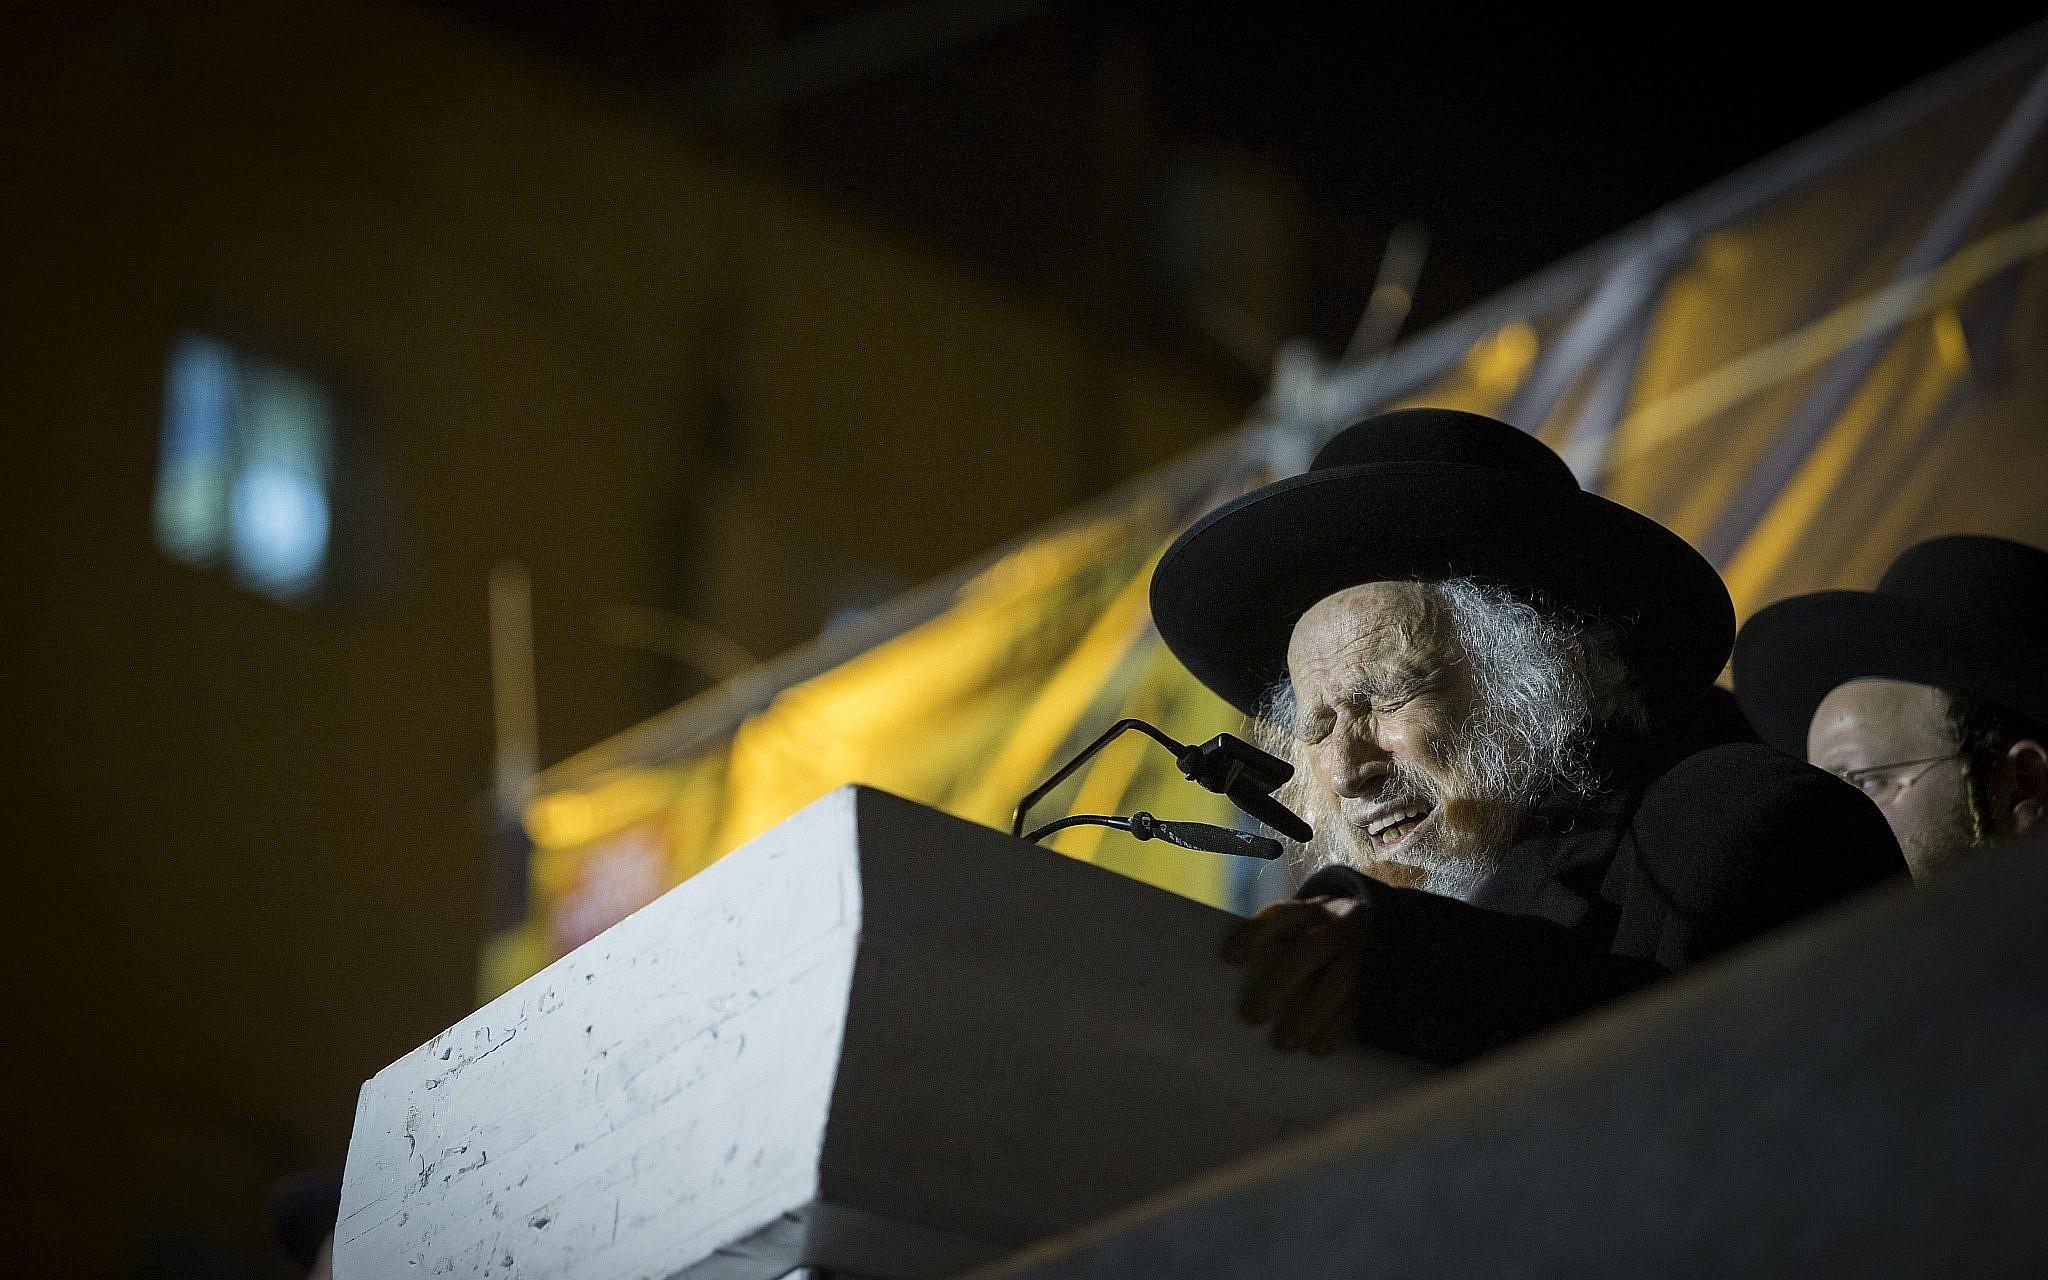 Ultra-orthodox Jews mourn passing of spiritual leader in Jerusalem